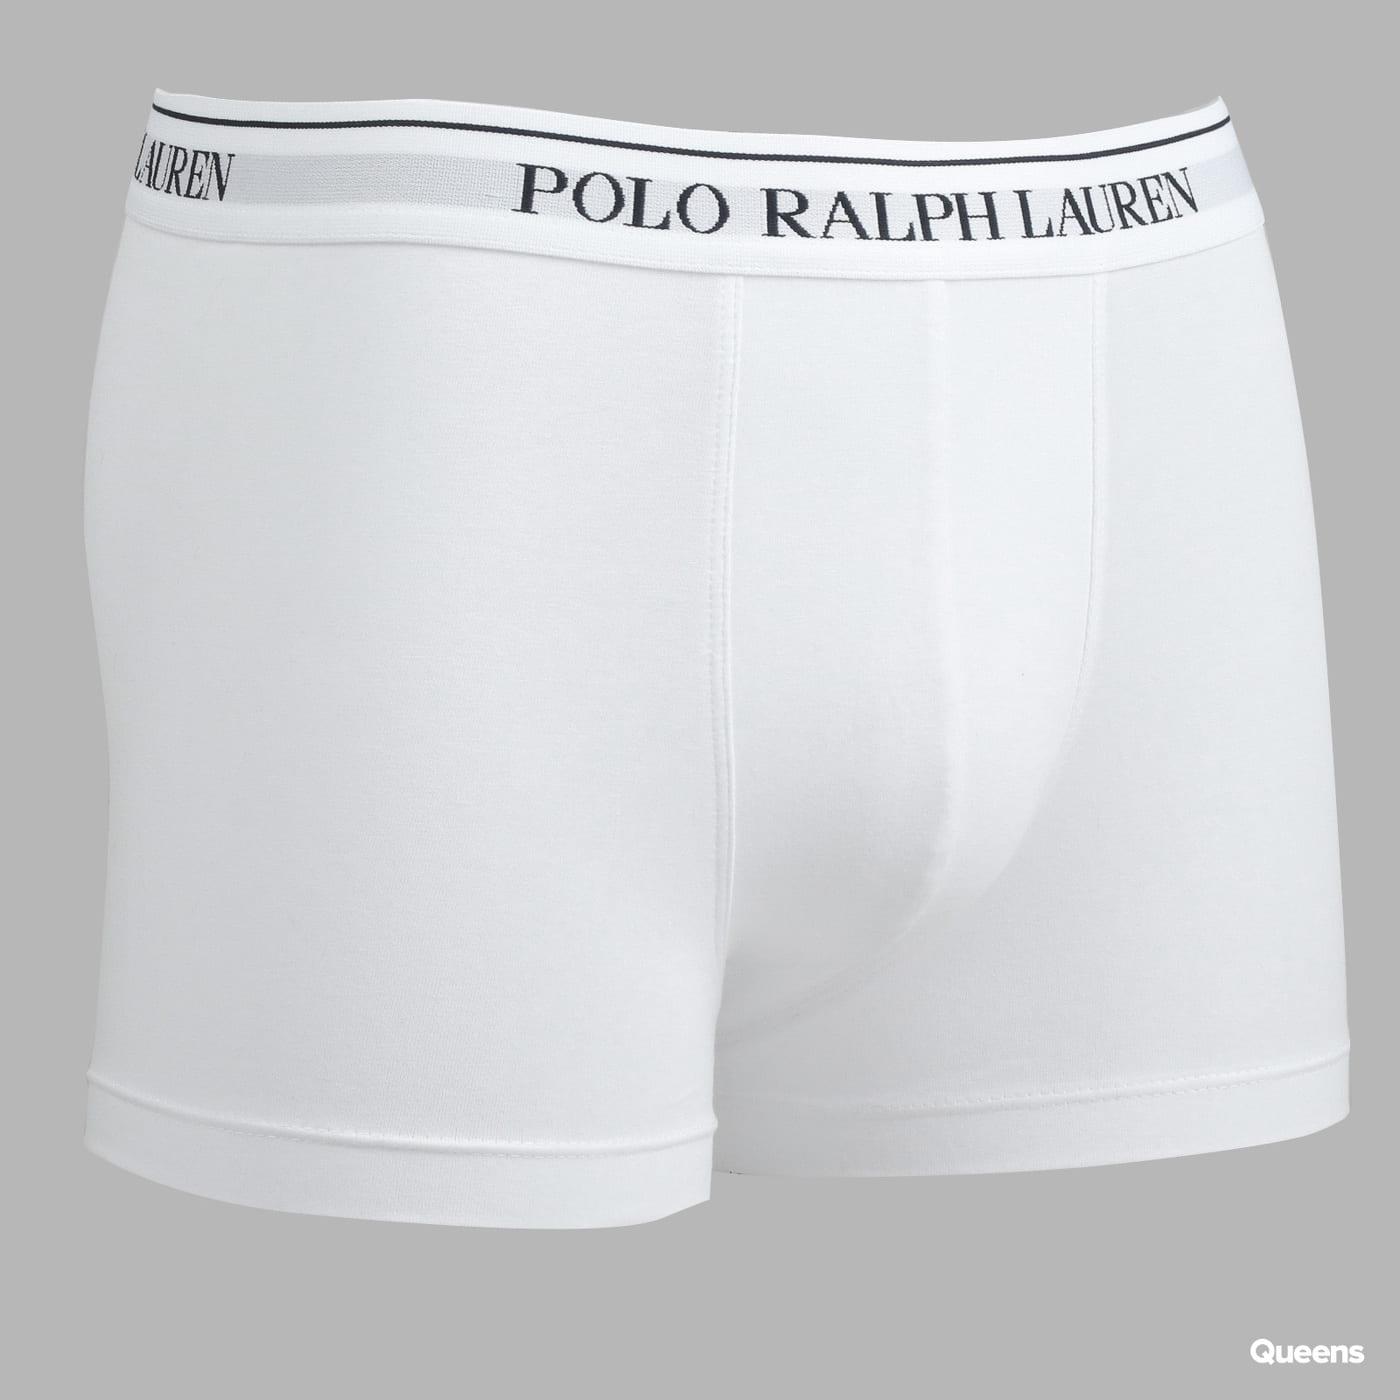 Polo Ralph Lauren 3 Pack Classic Trunks C/O melange šedé / biele / čierne